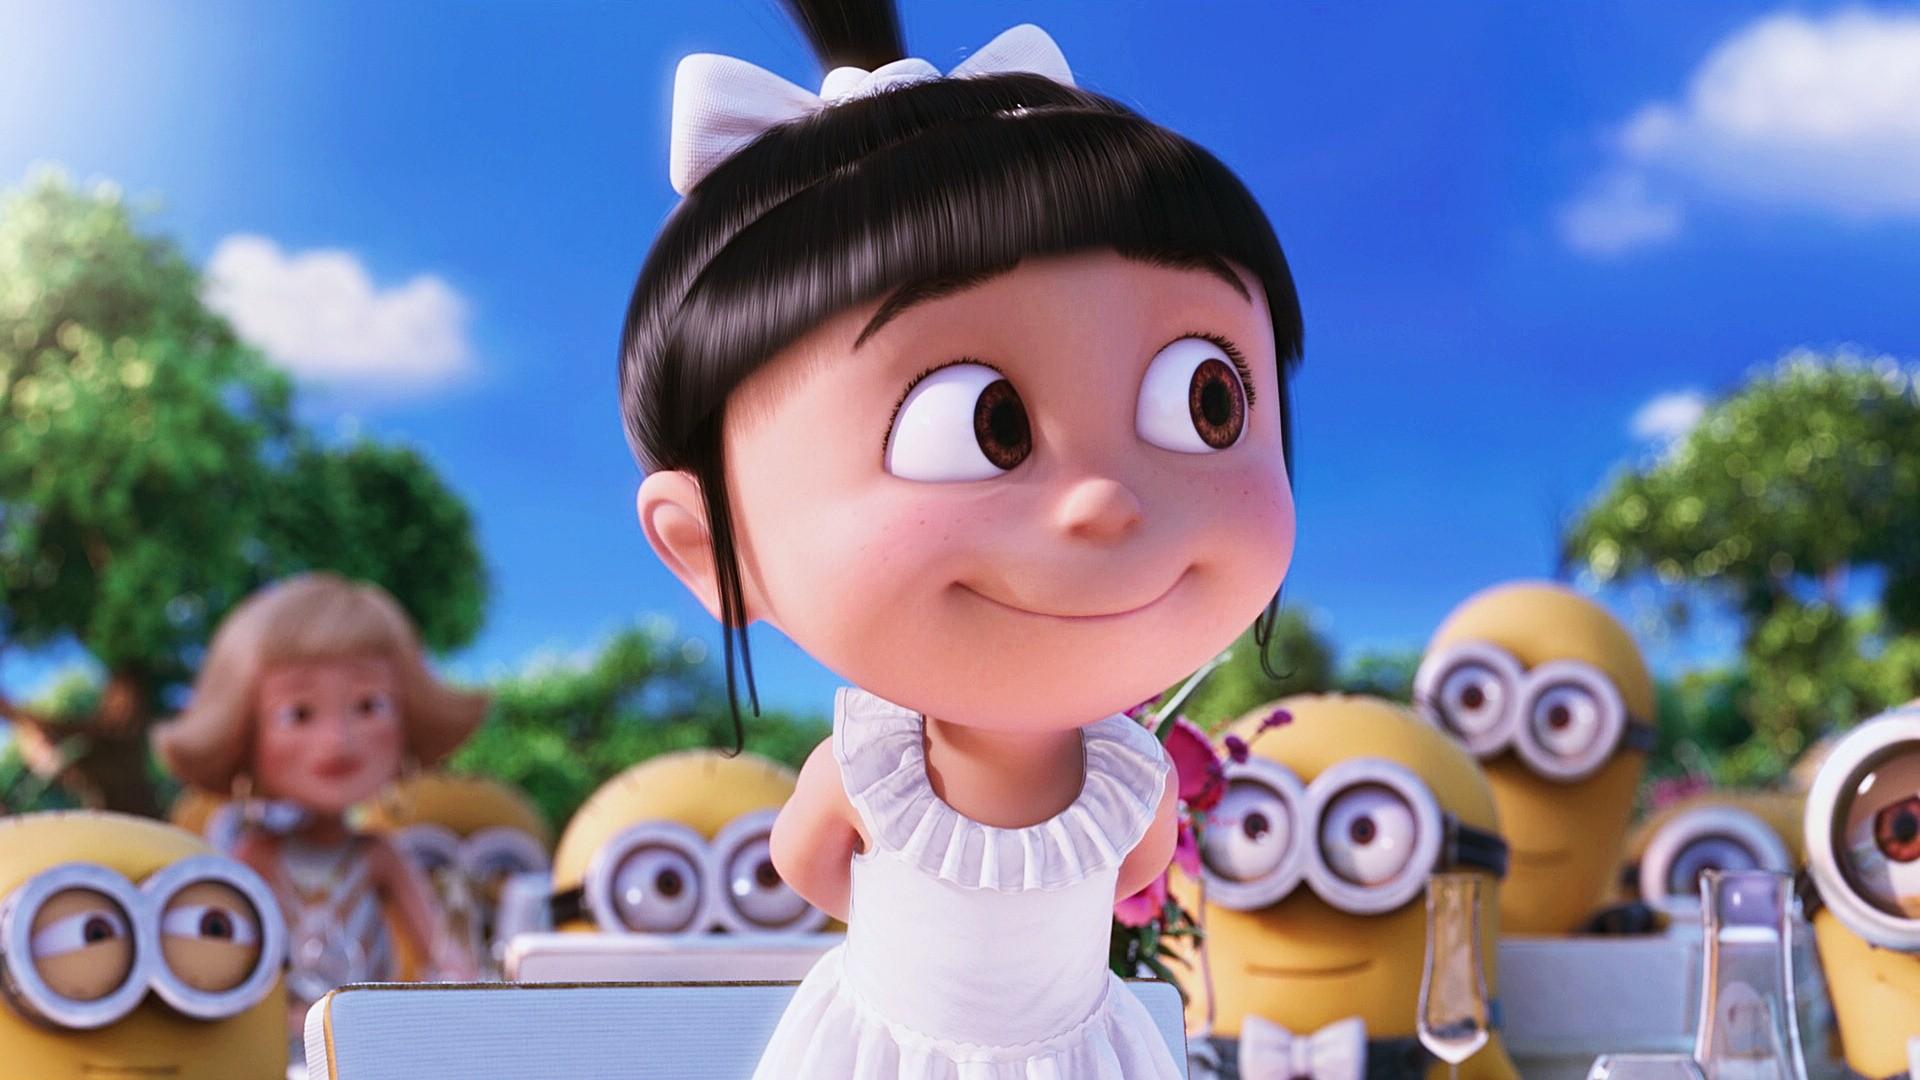 Agnes photos despicable me Despicable Me 3 (2017) - Rotten Tomatoes